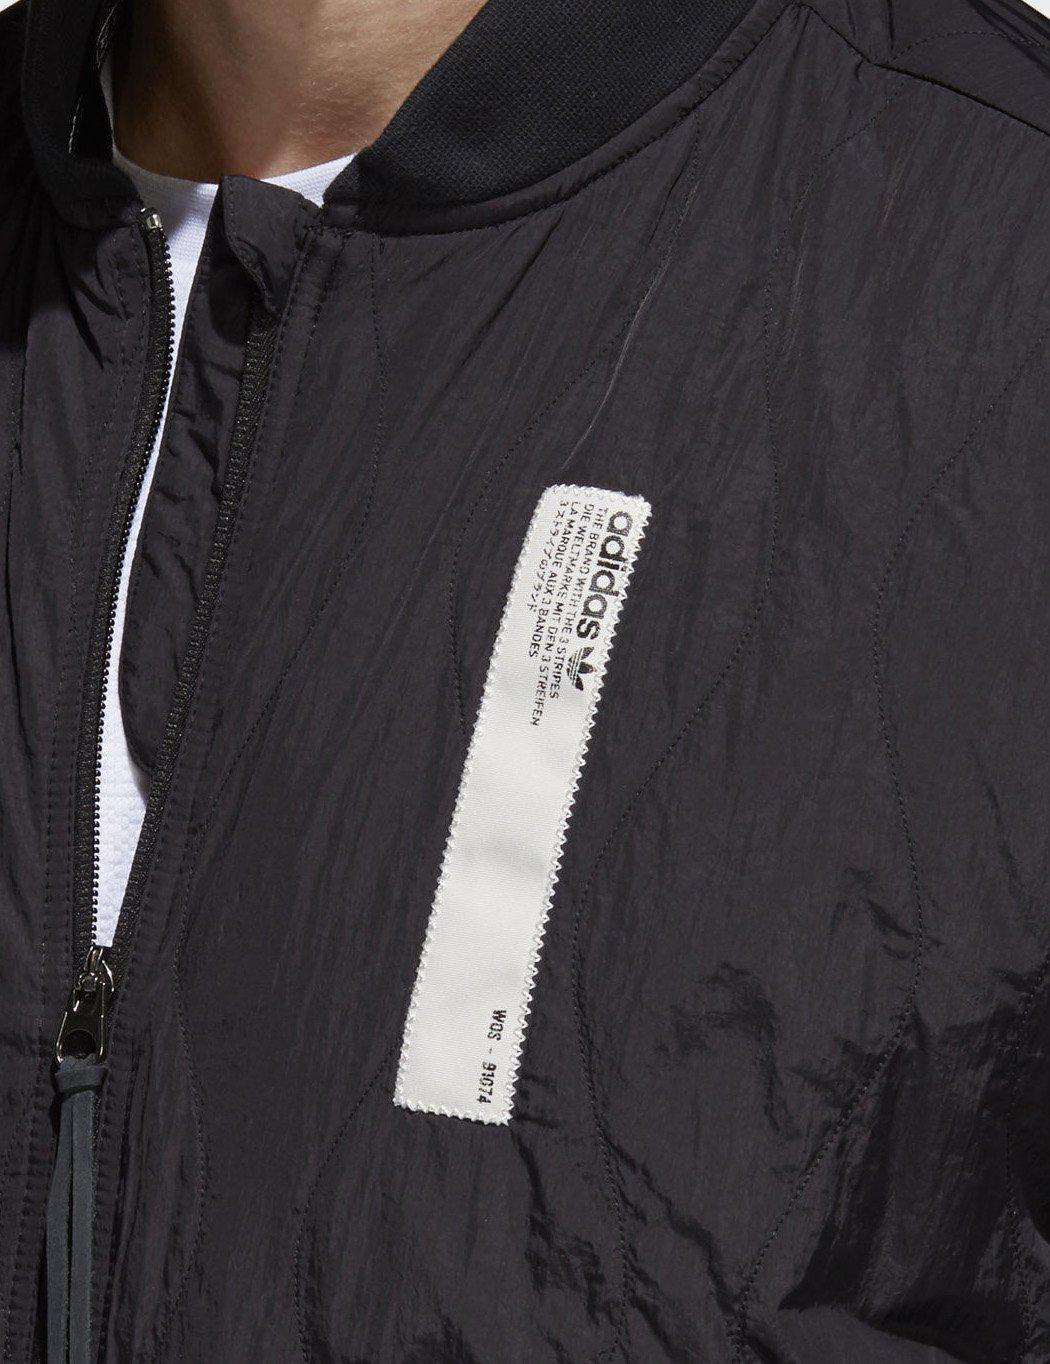 Jacket Adidas Nmd Track Adidas Primaloft Nmd Primaloft Jacket Track KJc3FTl1